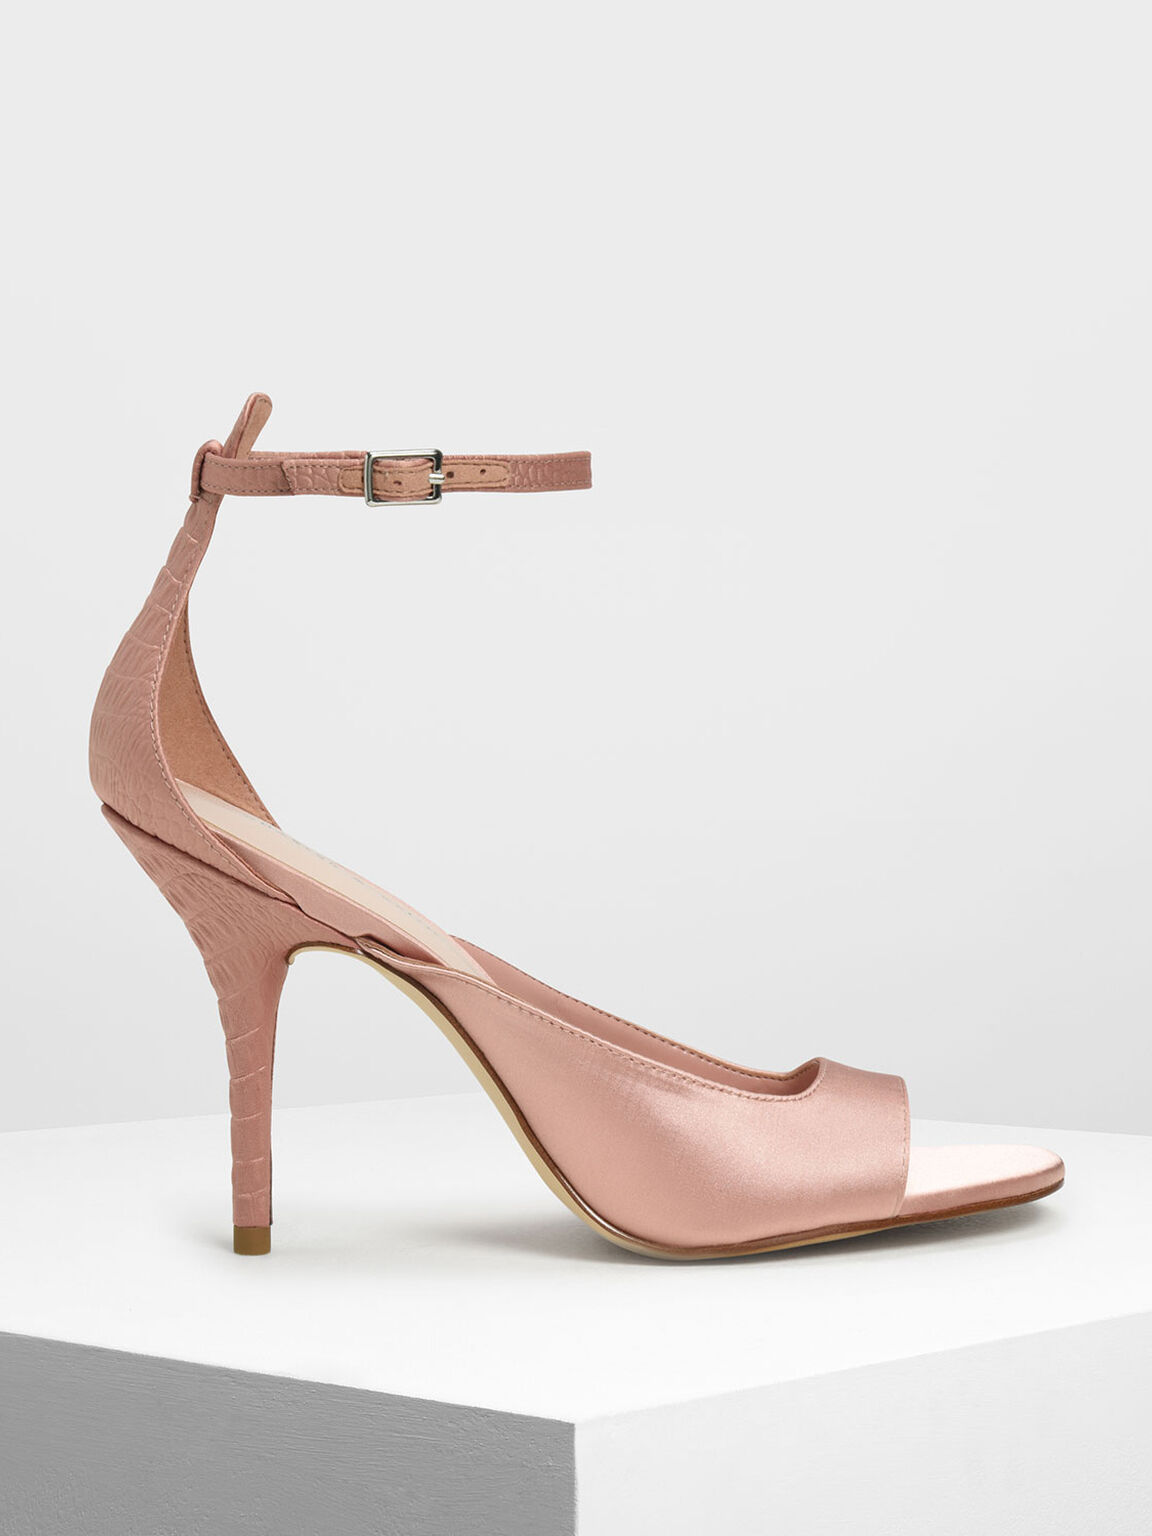 Satin Ankle Strap Heels, Nude, hi-res